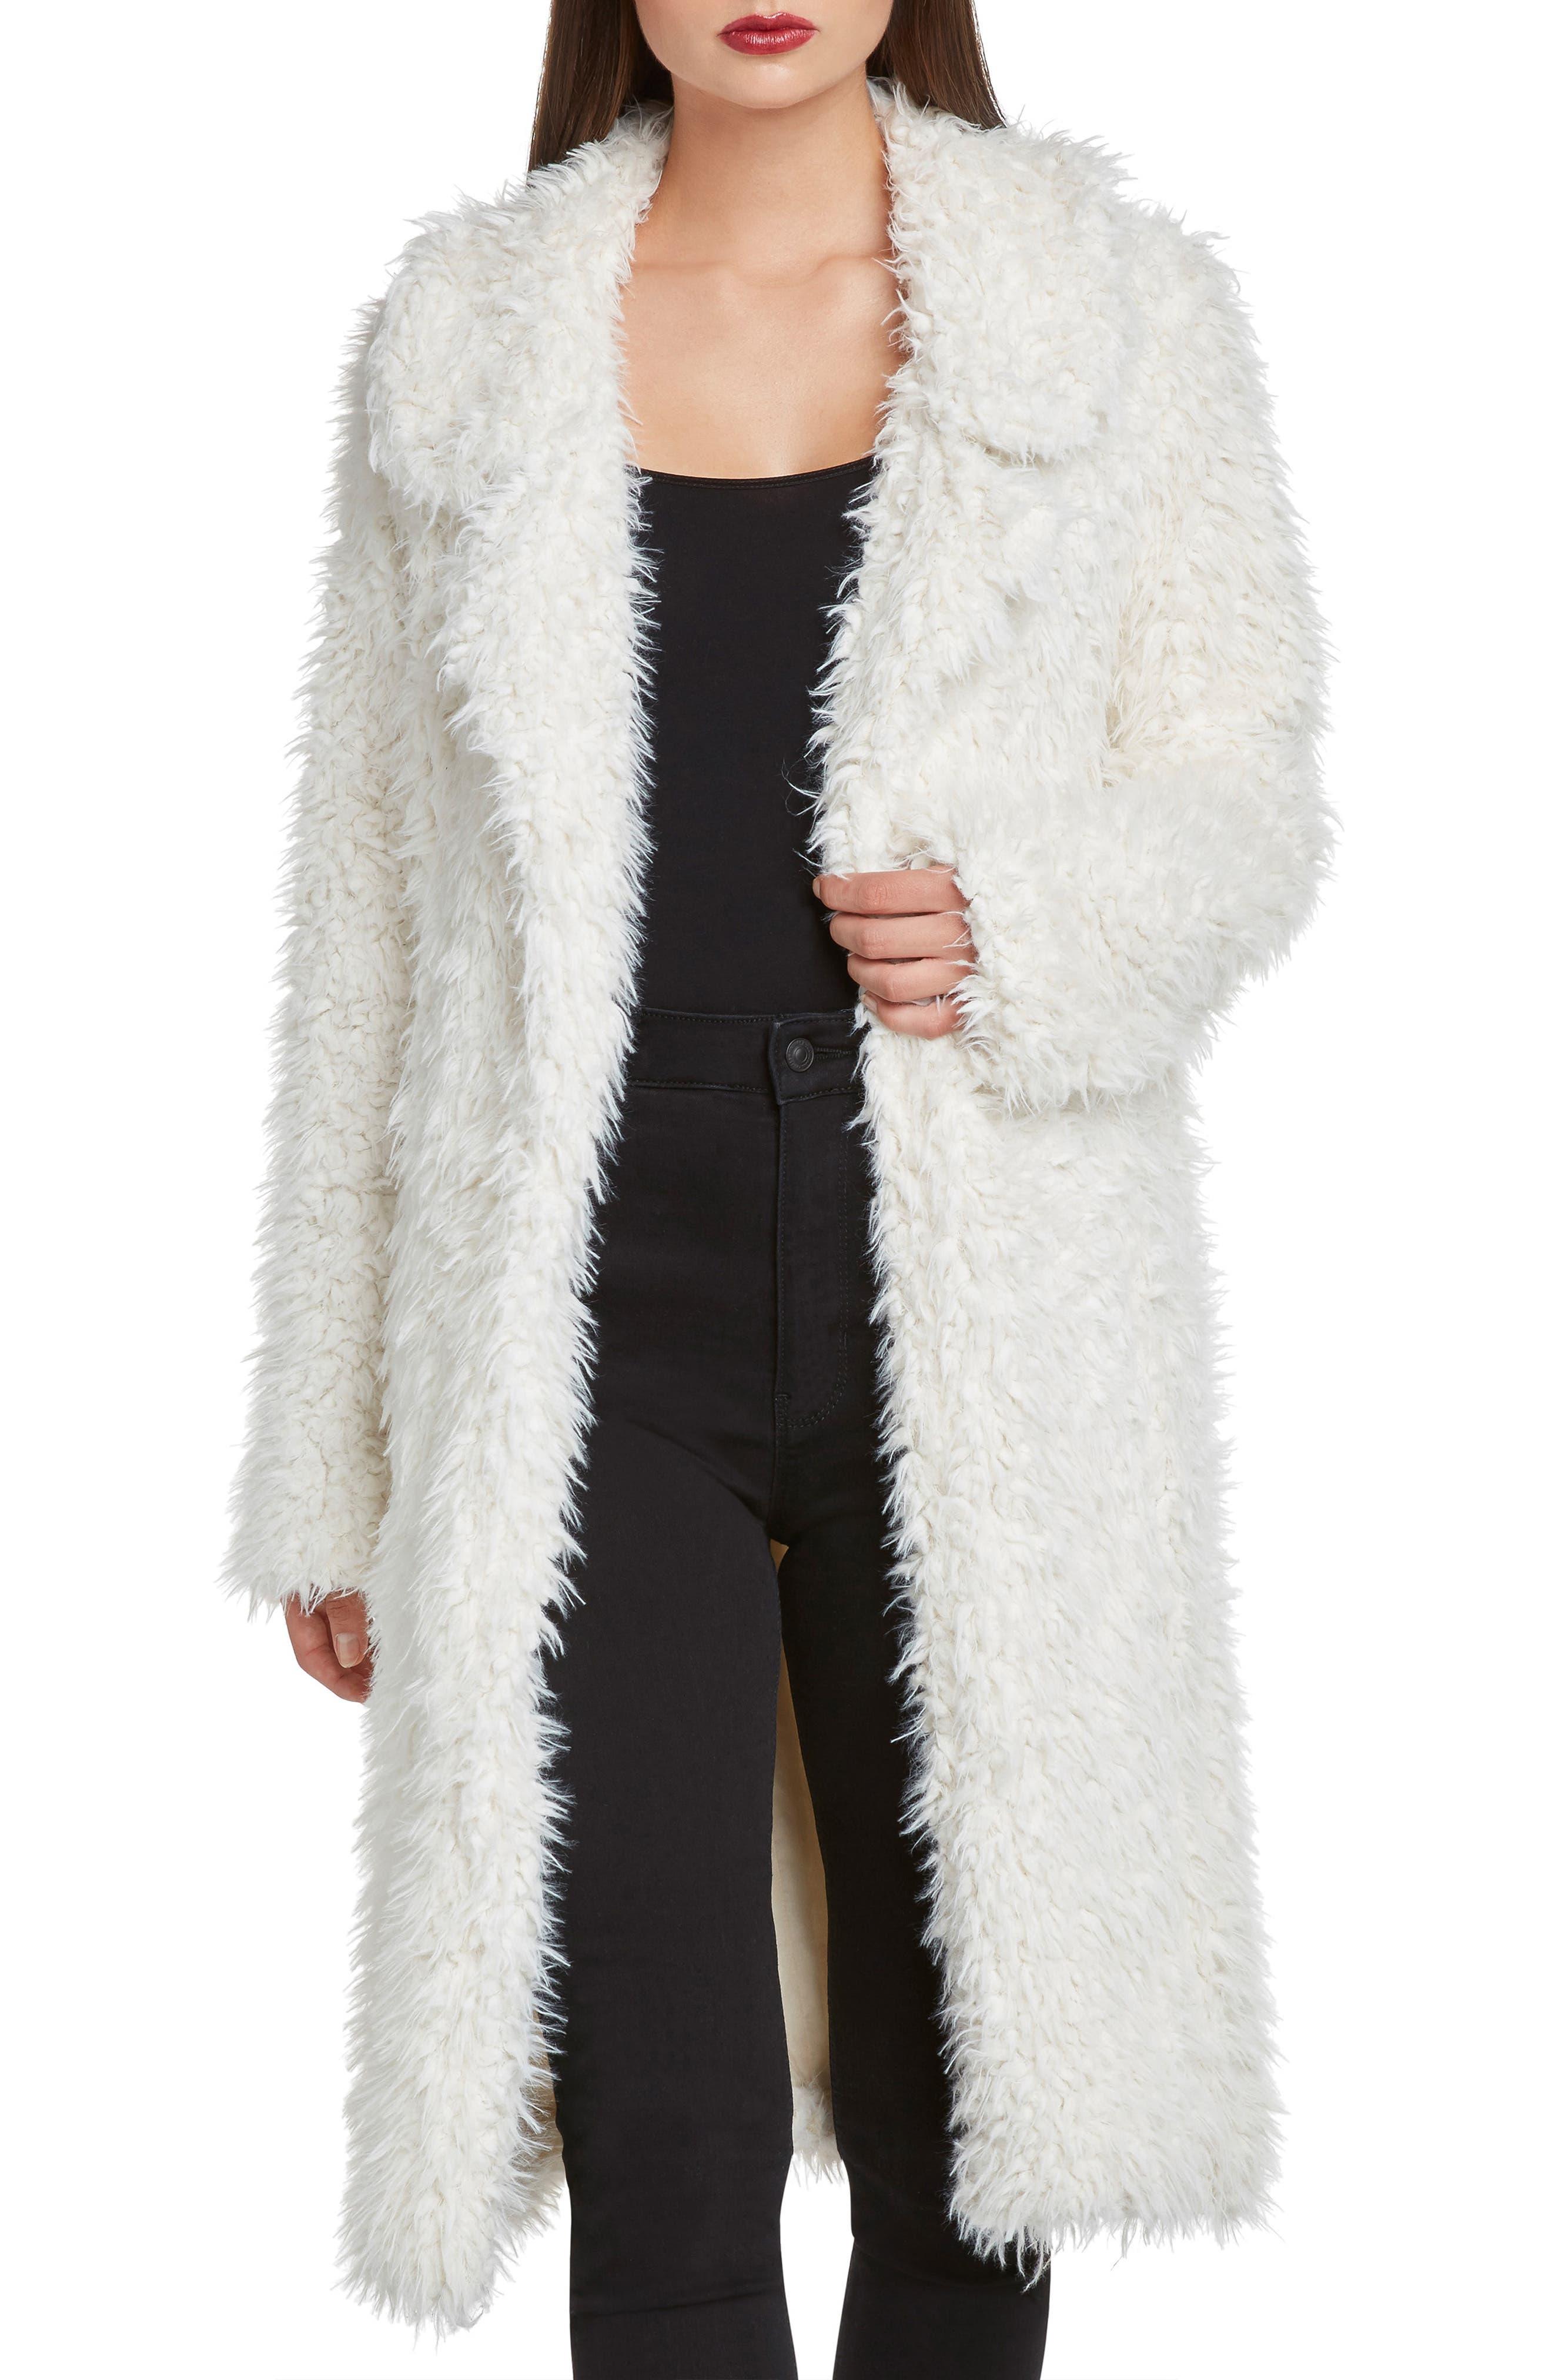 WILLOW & CLAY,                             Faux Fur Jacket,                             Main thumbnail 1, color,                             900